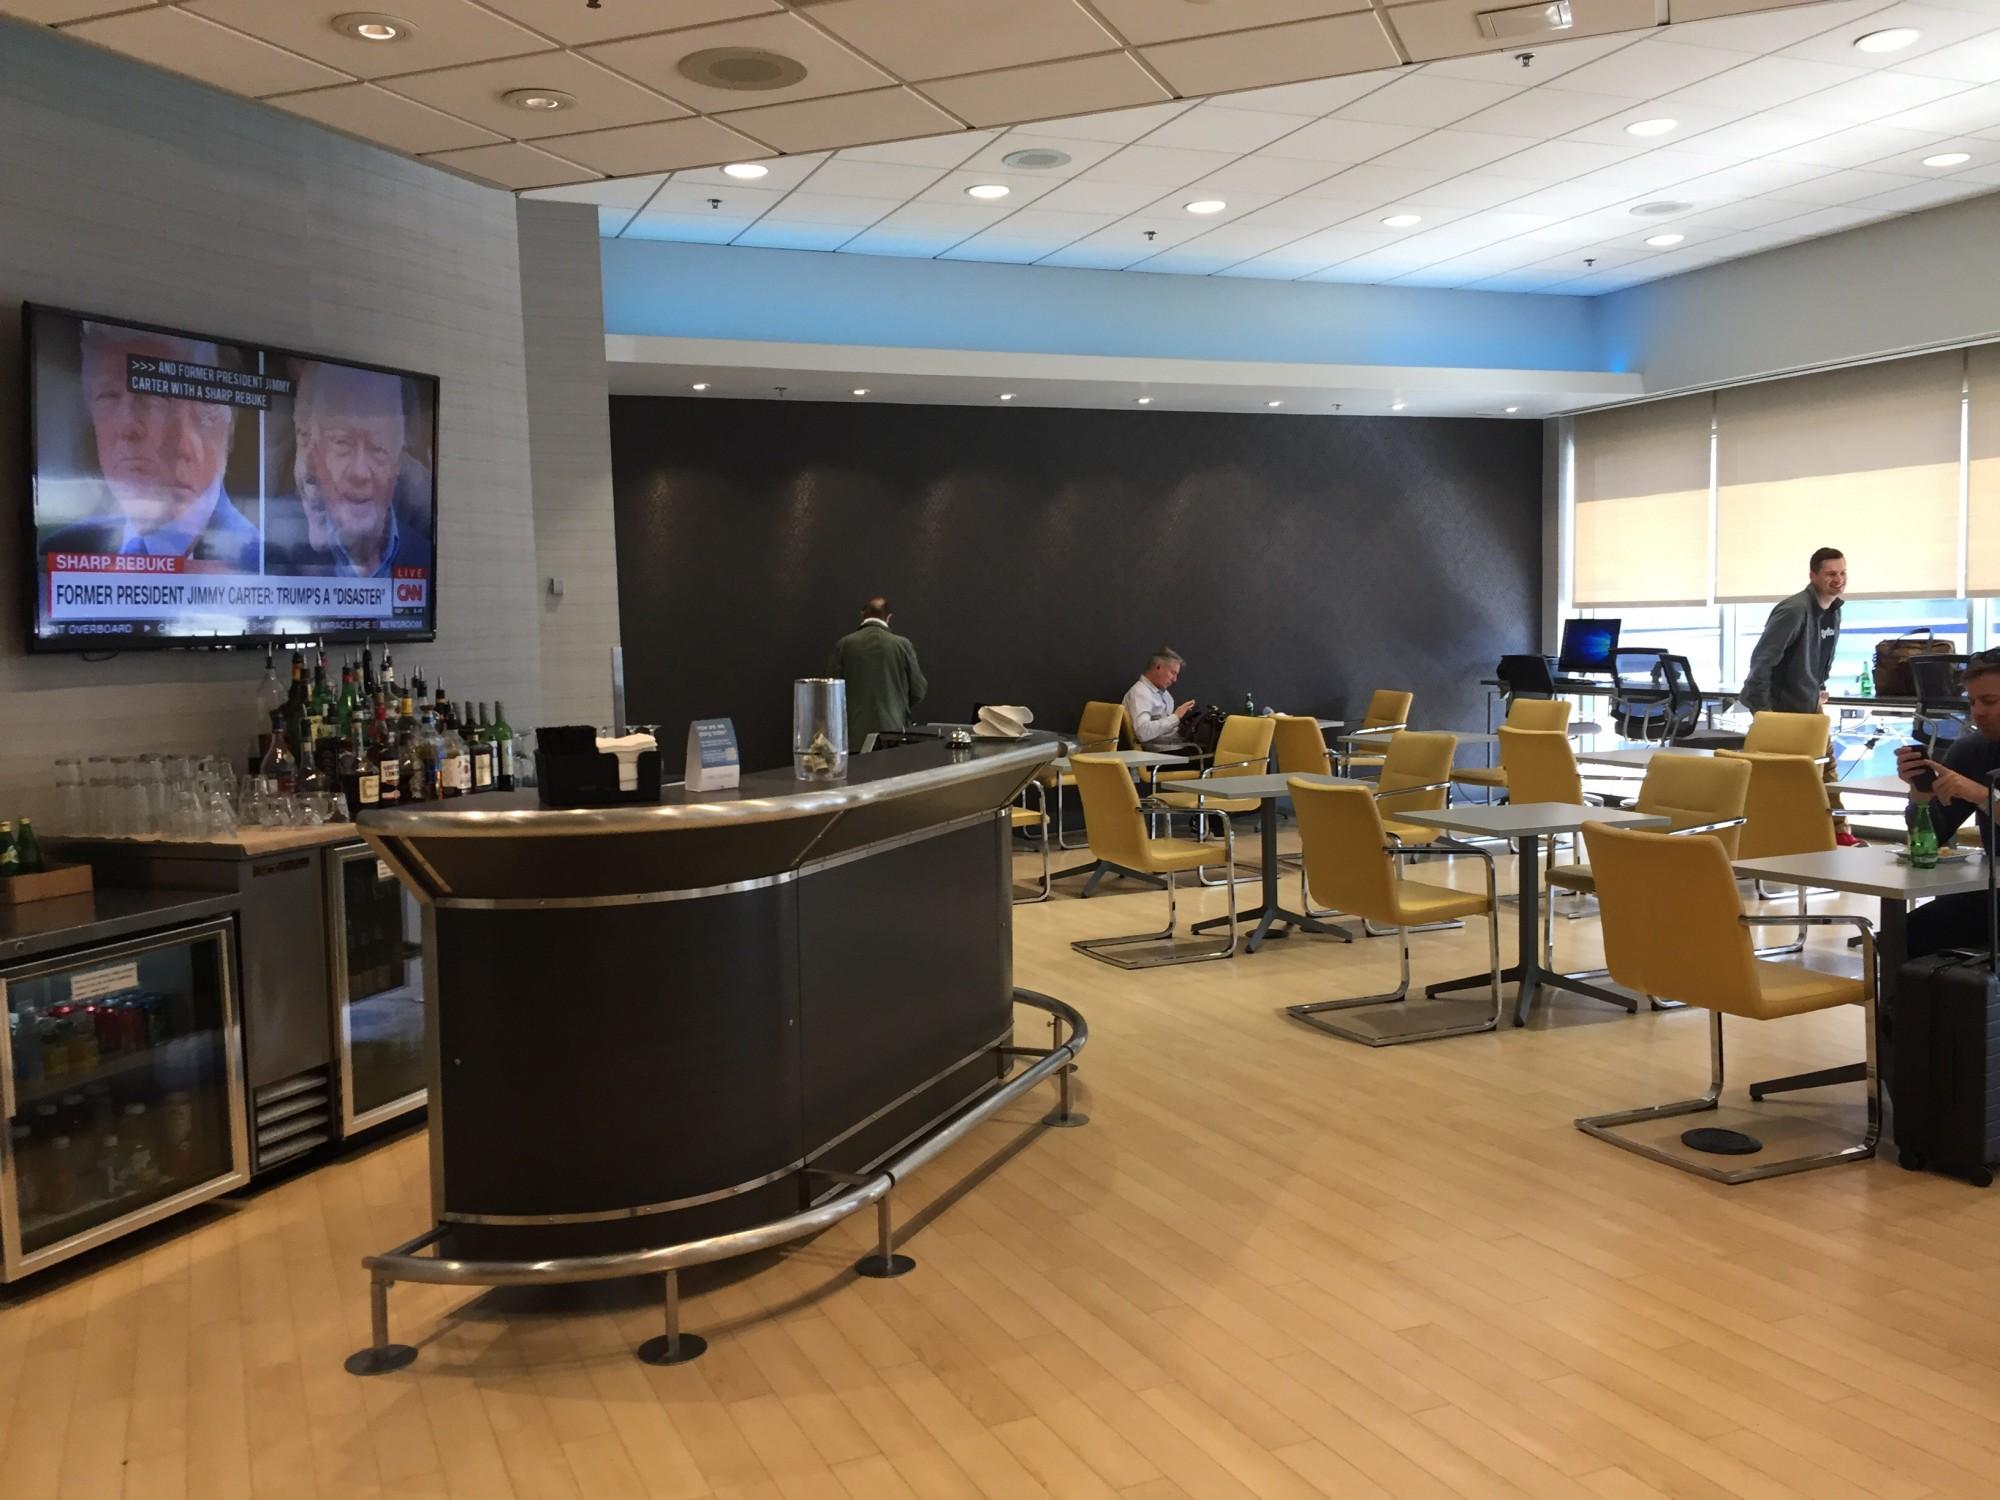 Bos Logan International Airport Lounge Access United States